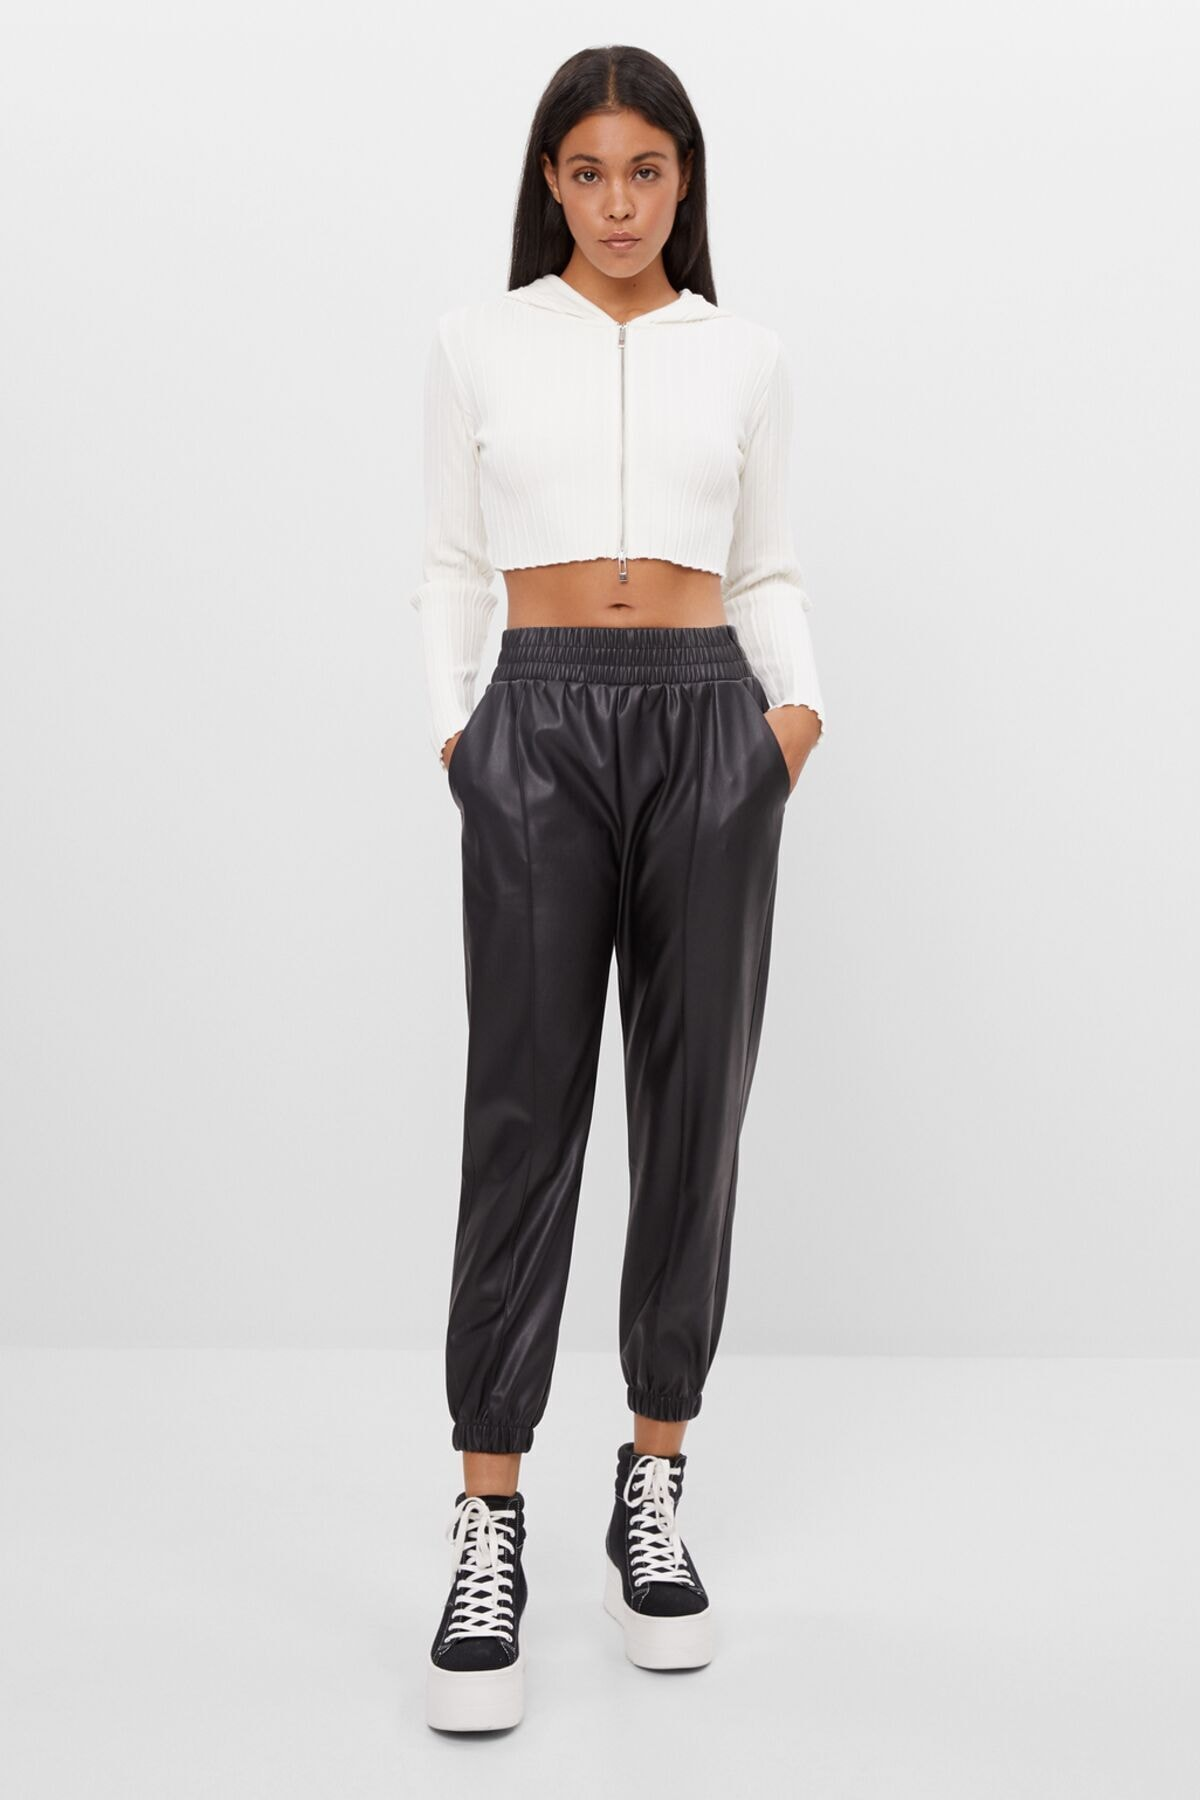 Bershka Kadın Siyah Deri Efektli Jogger Pantolon 1